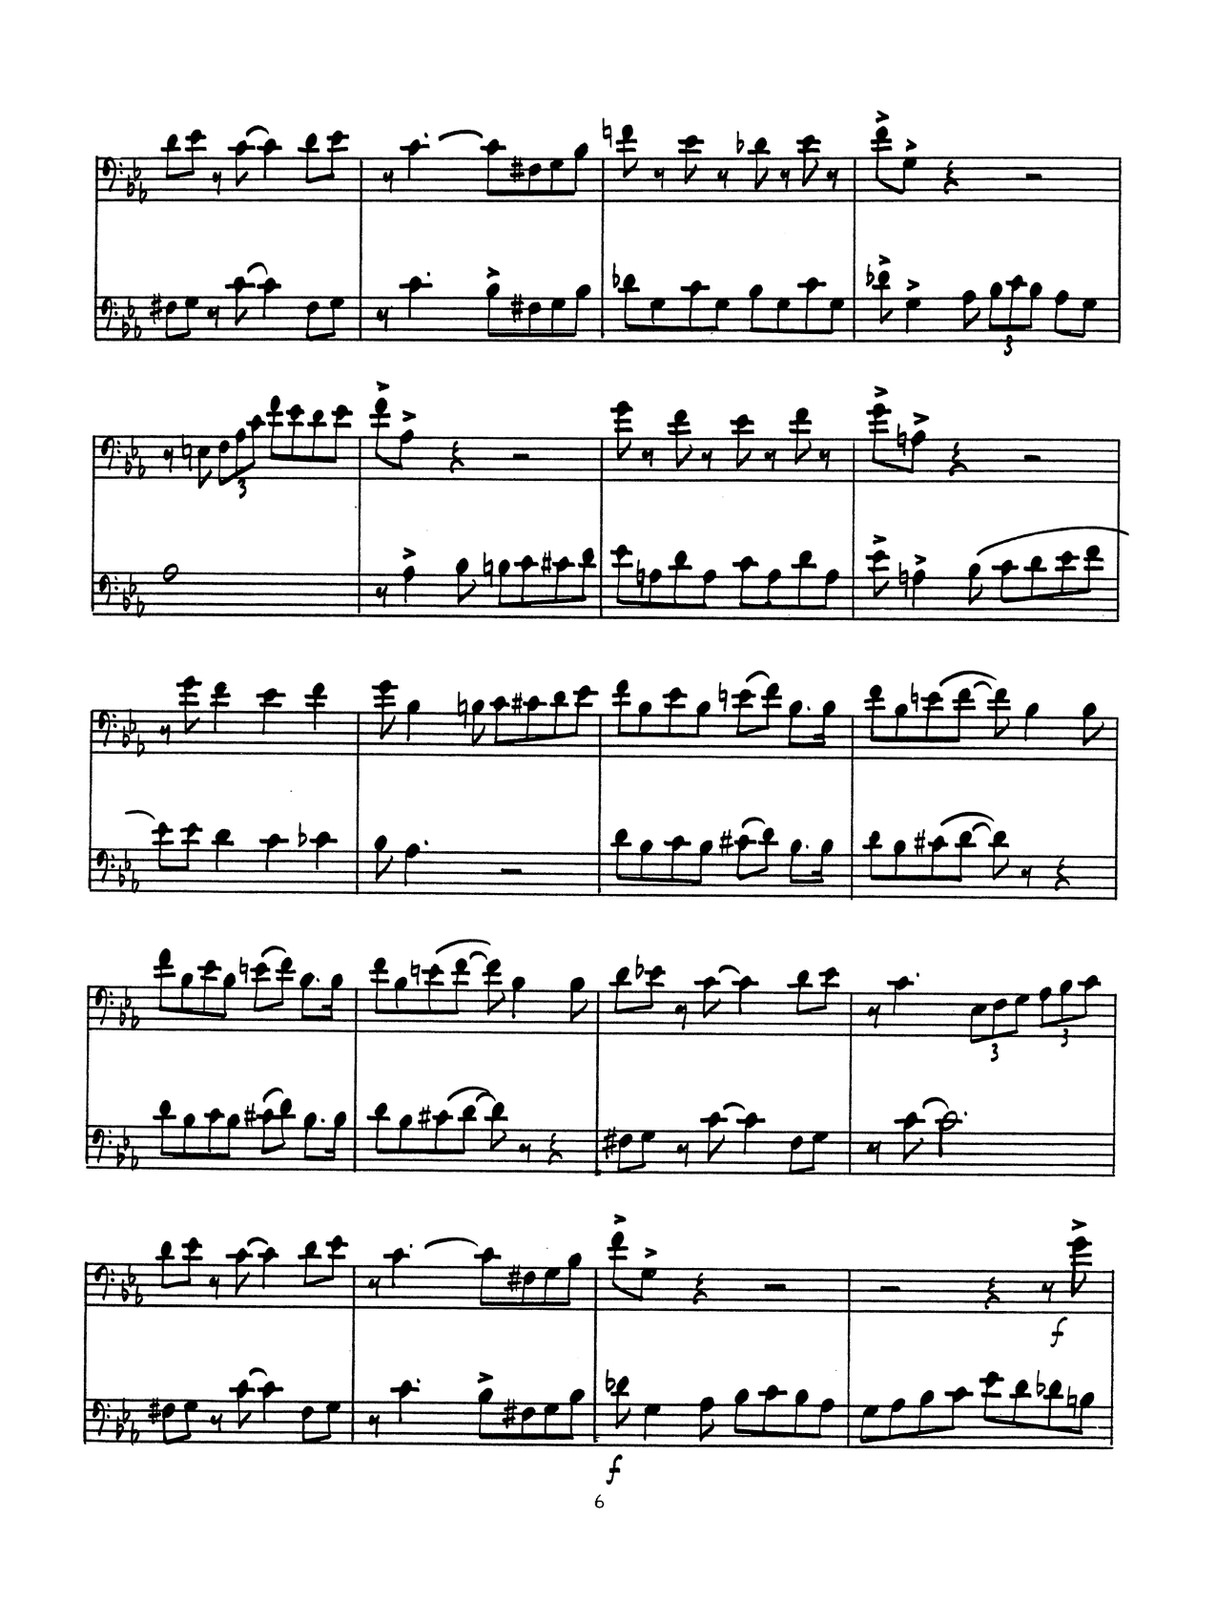 bop duets bass clef